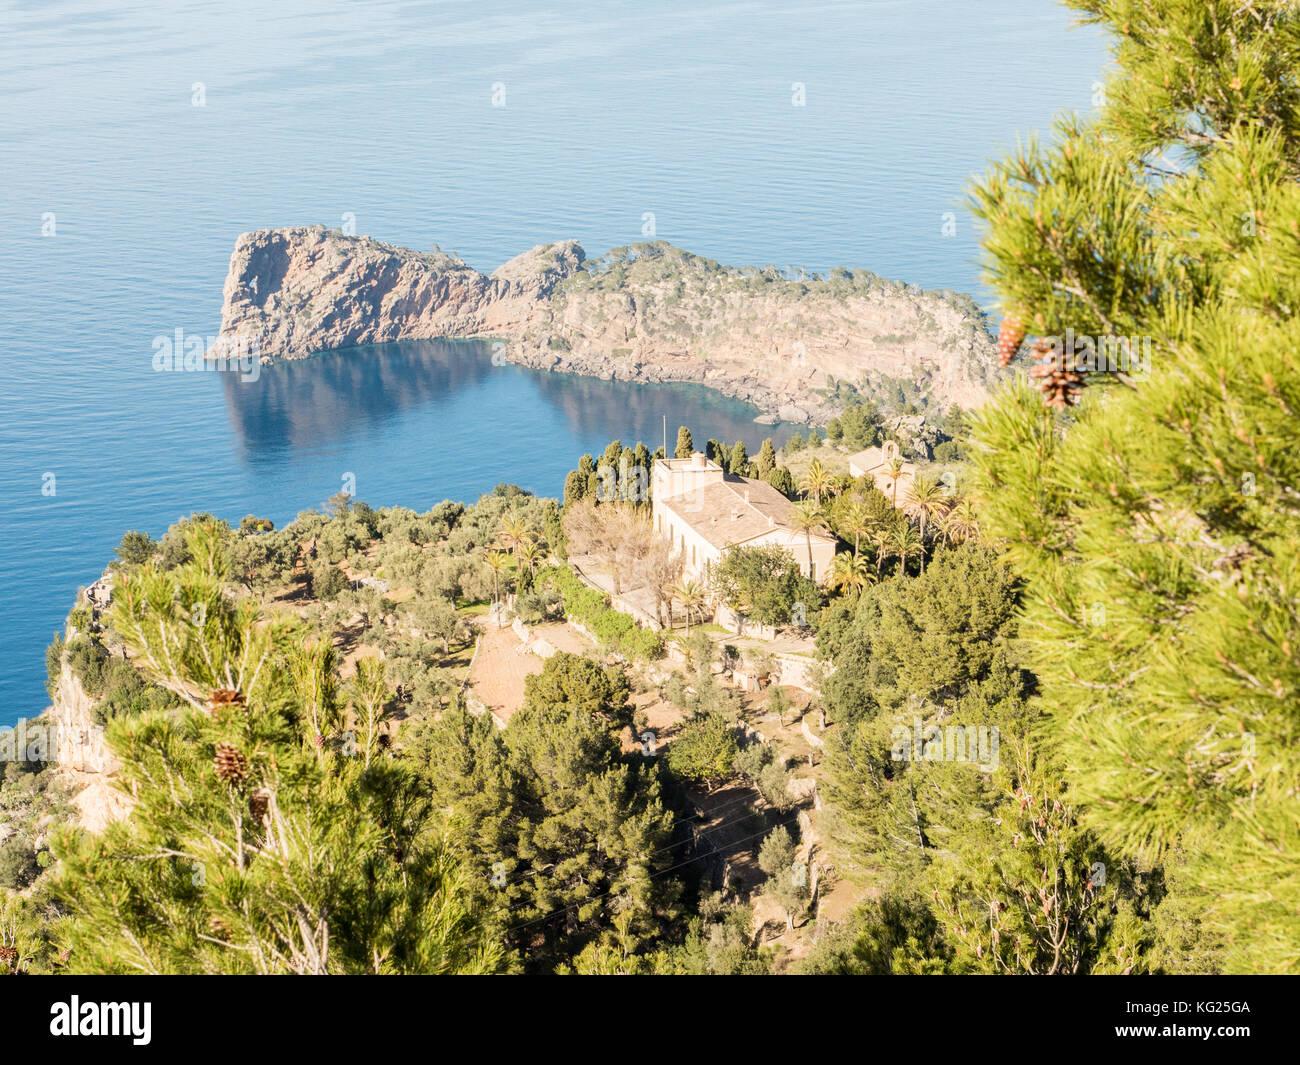 Littoral près de valdemossa, Majorque, Iles Baléares, Espagne, Méditerranée, Europe Photo Stock